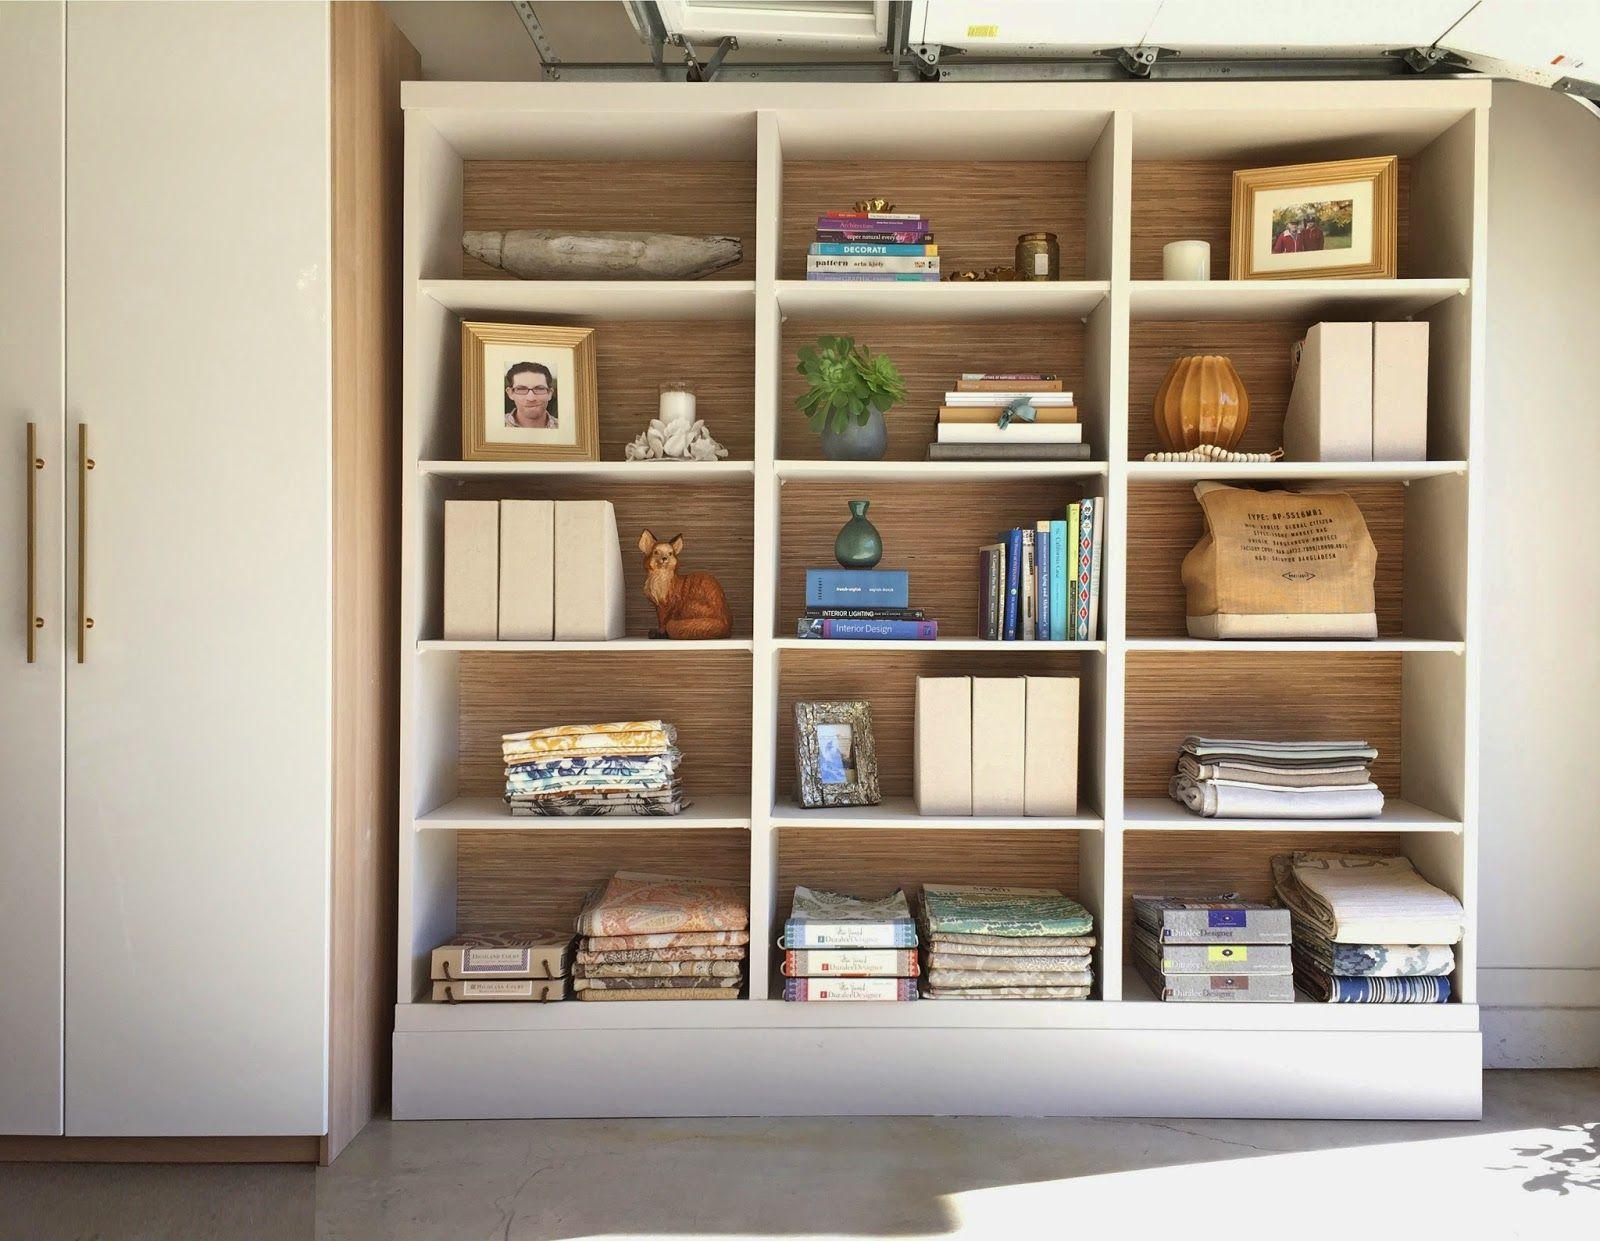 TrovareDesign DIY IKEA PAX Bookcase Hack A few days